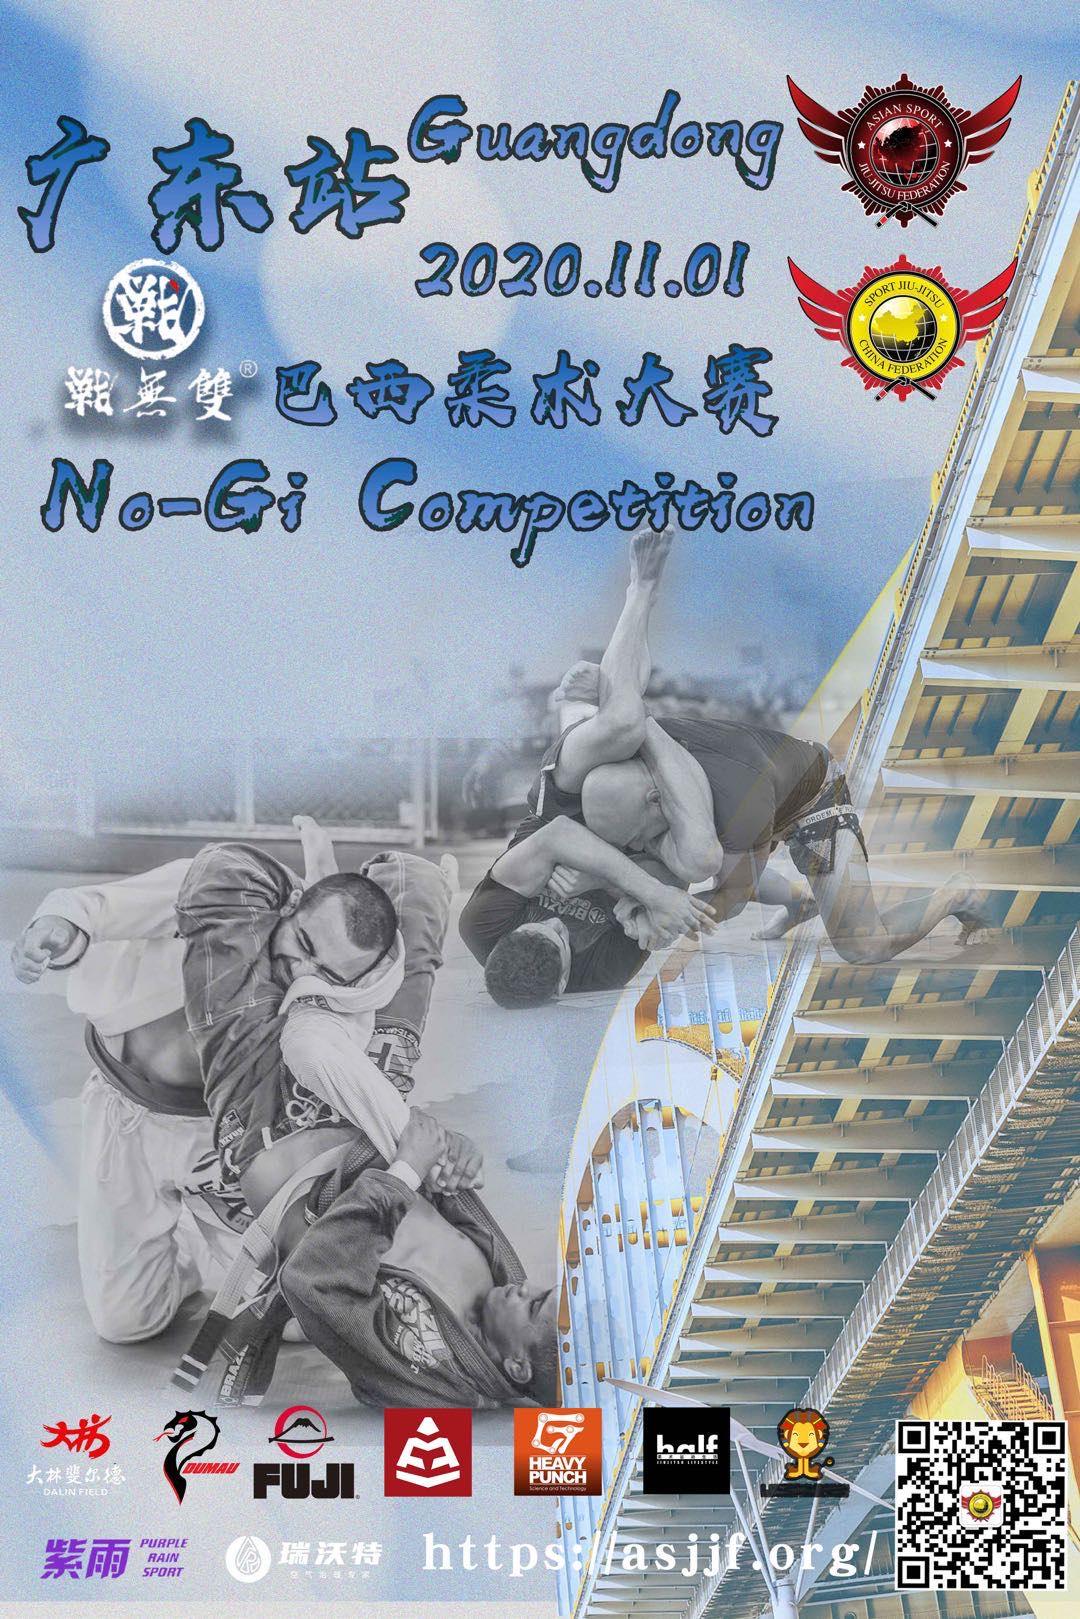 SJJCF Guangdong NO-GI Championship 2020